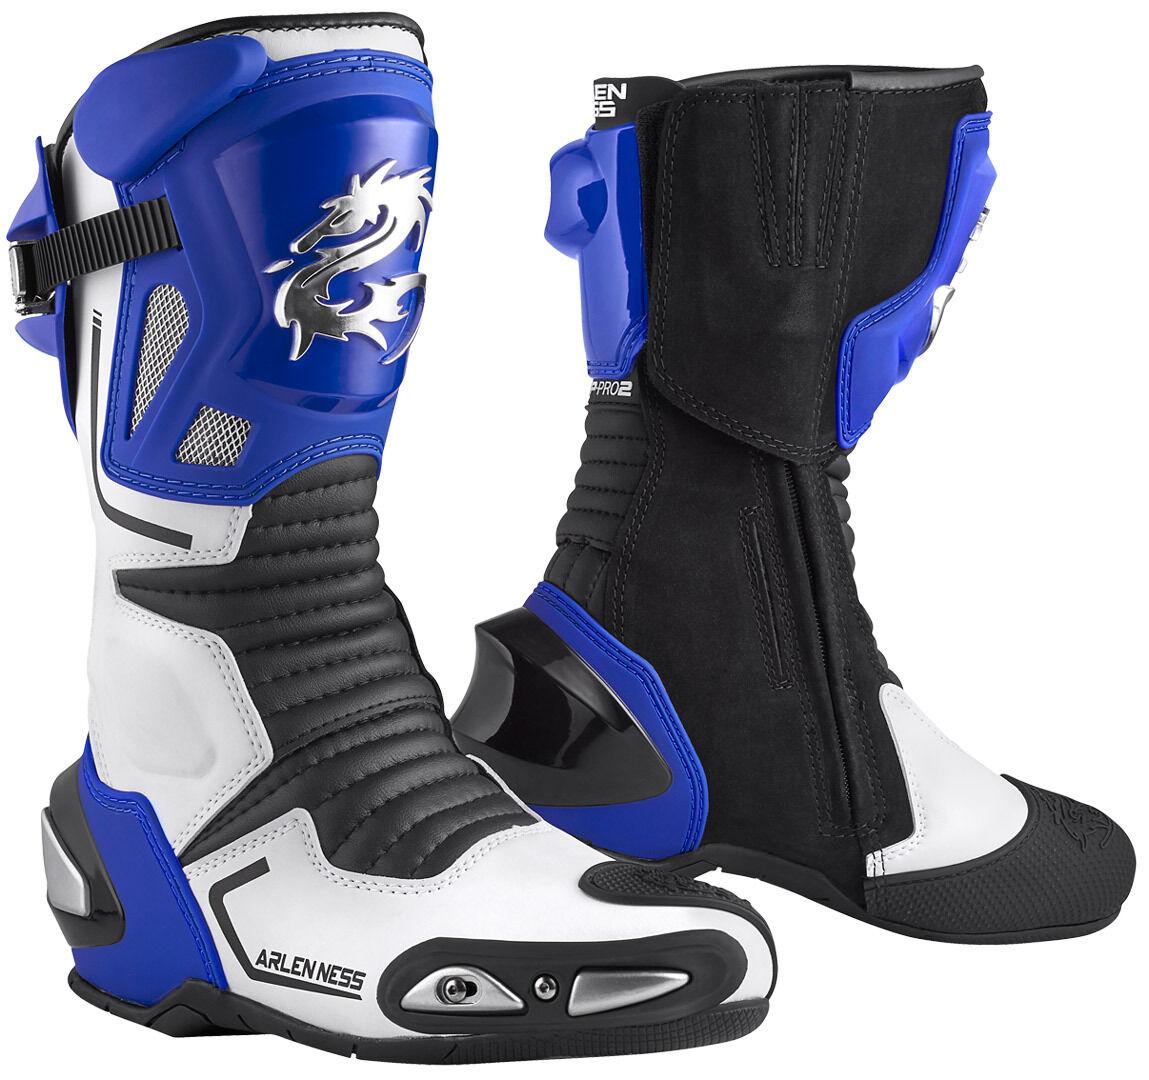 Arlen Ness Sugello Bottes de moto Noir Blanc Bleu taille : 45